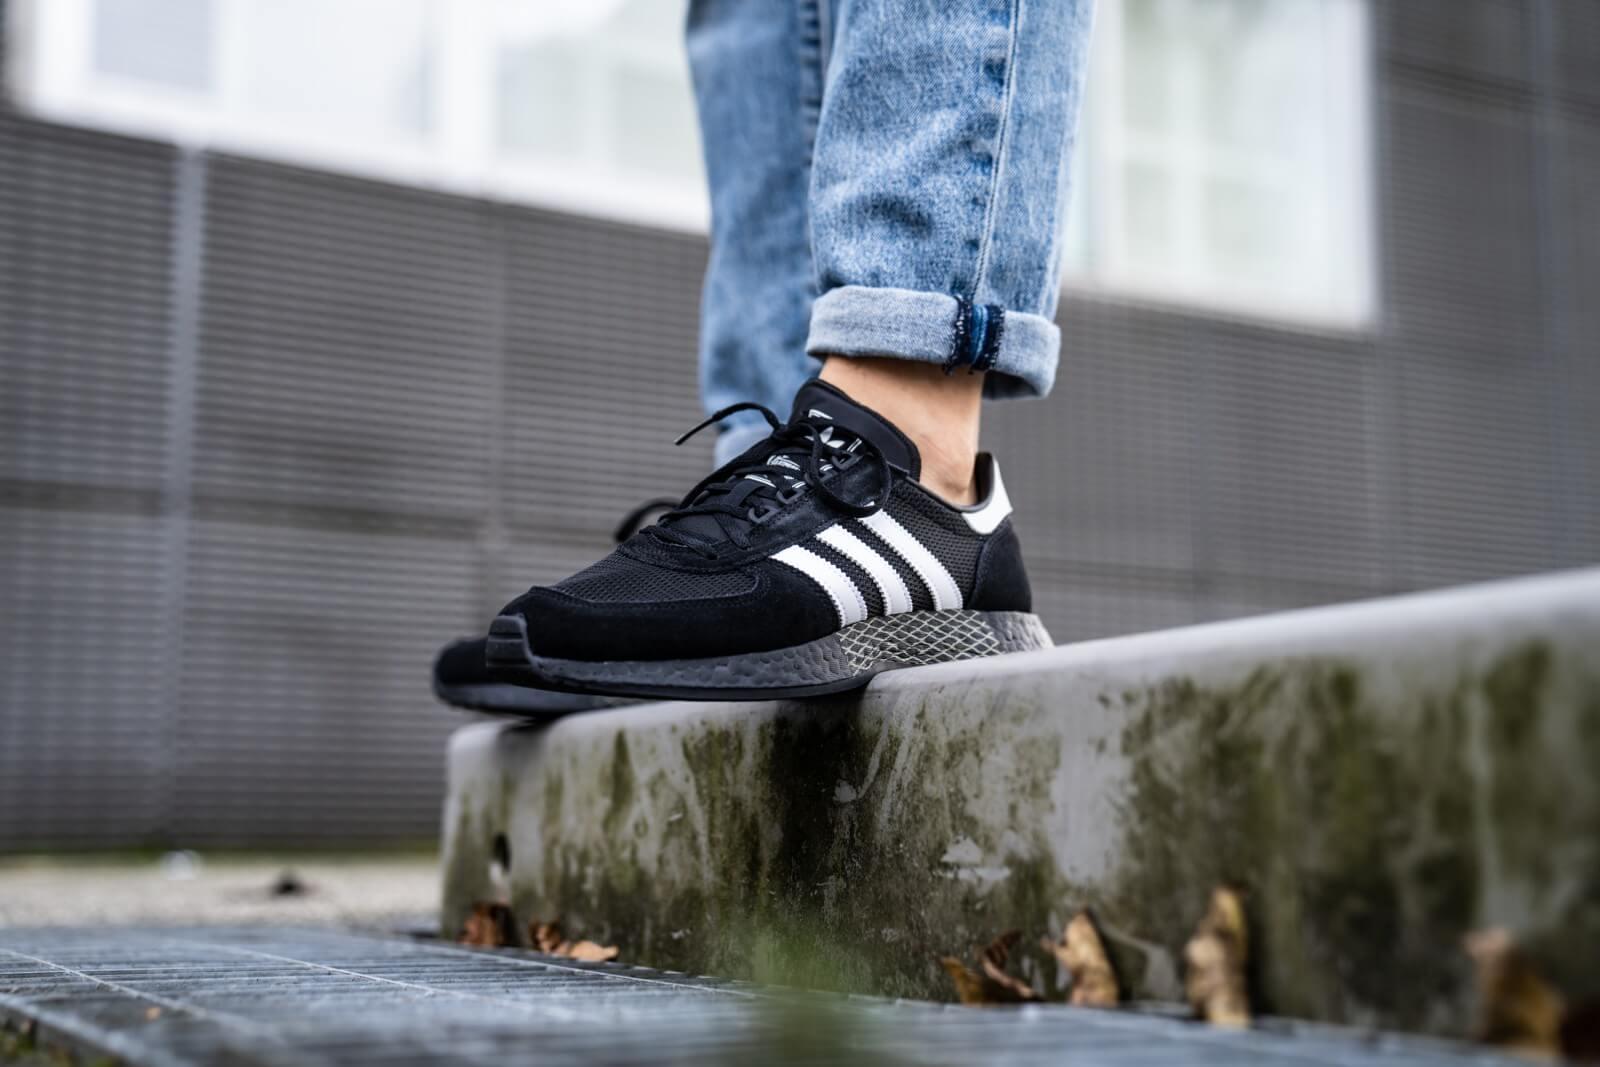 Adidas Marathon Tech Core BlackFootwear White Trace Cargo